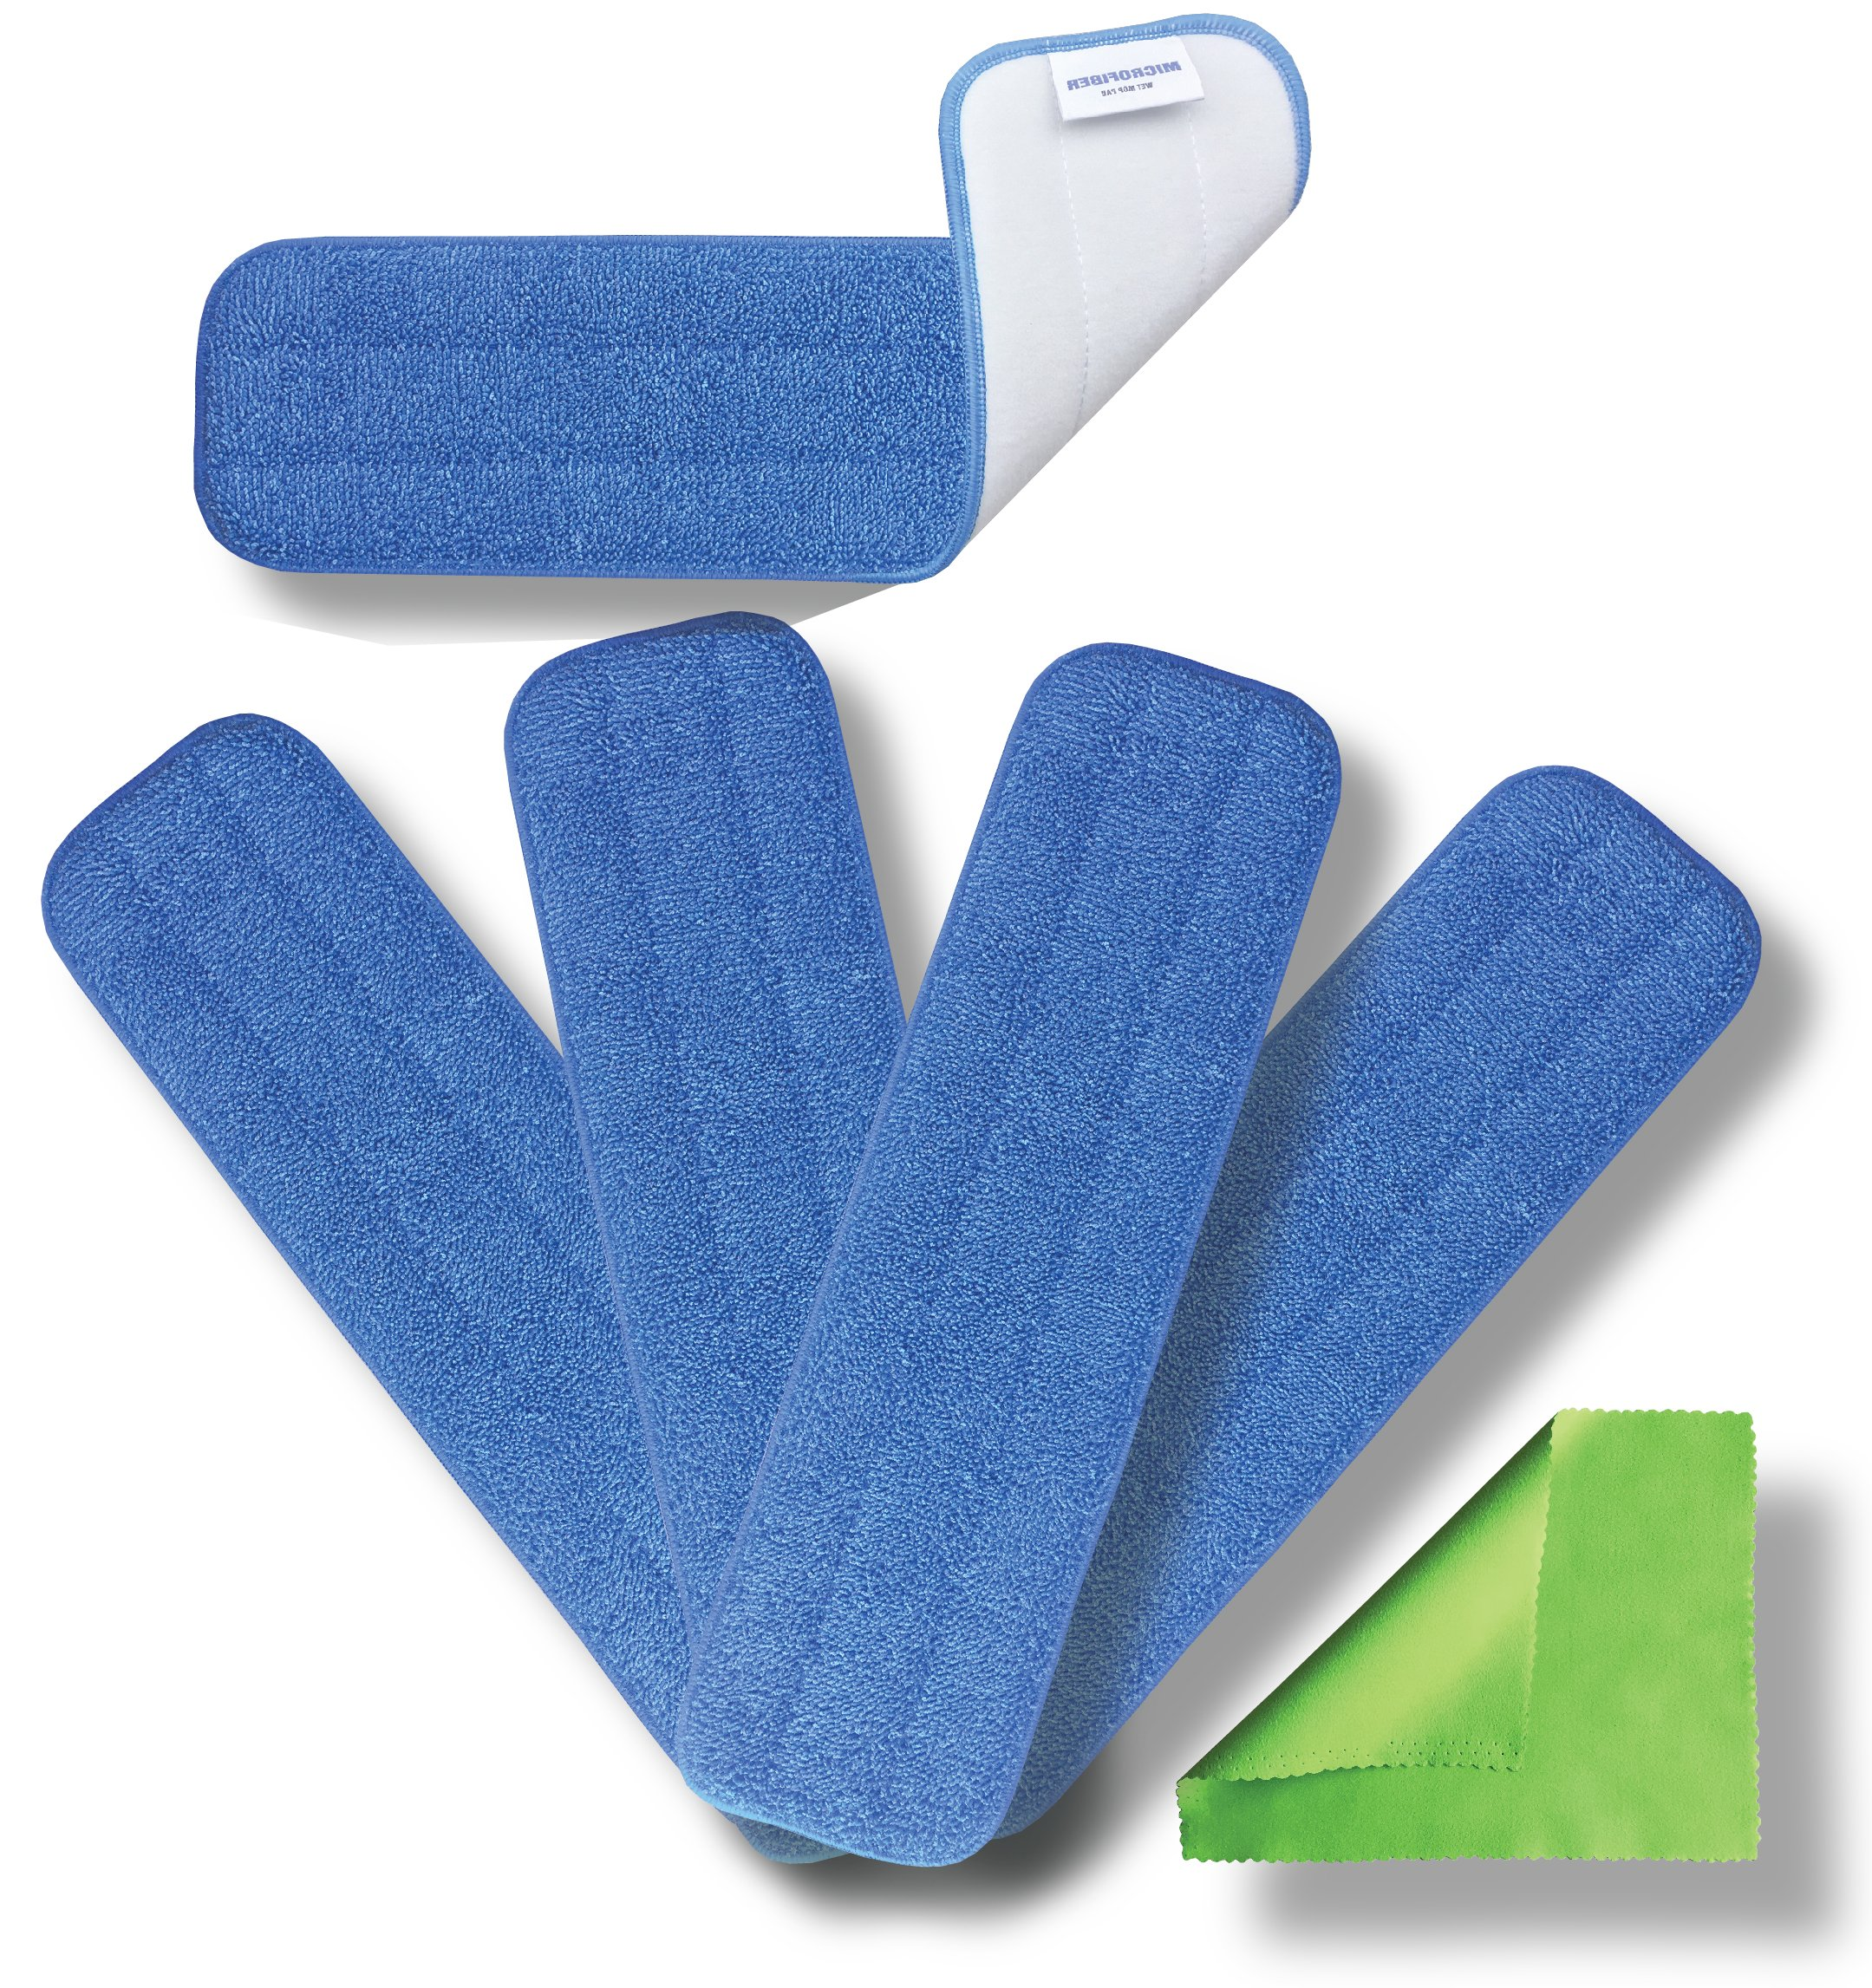 Buy Commercial Grade Microfiber Mop Washable Scrubber